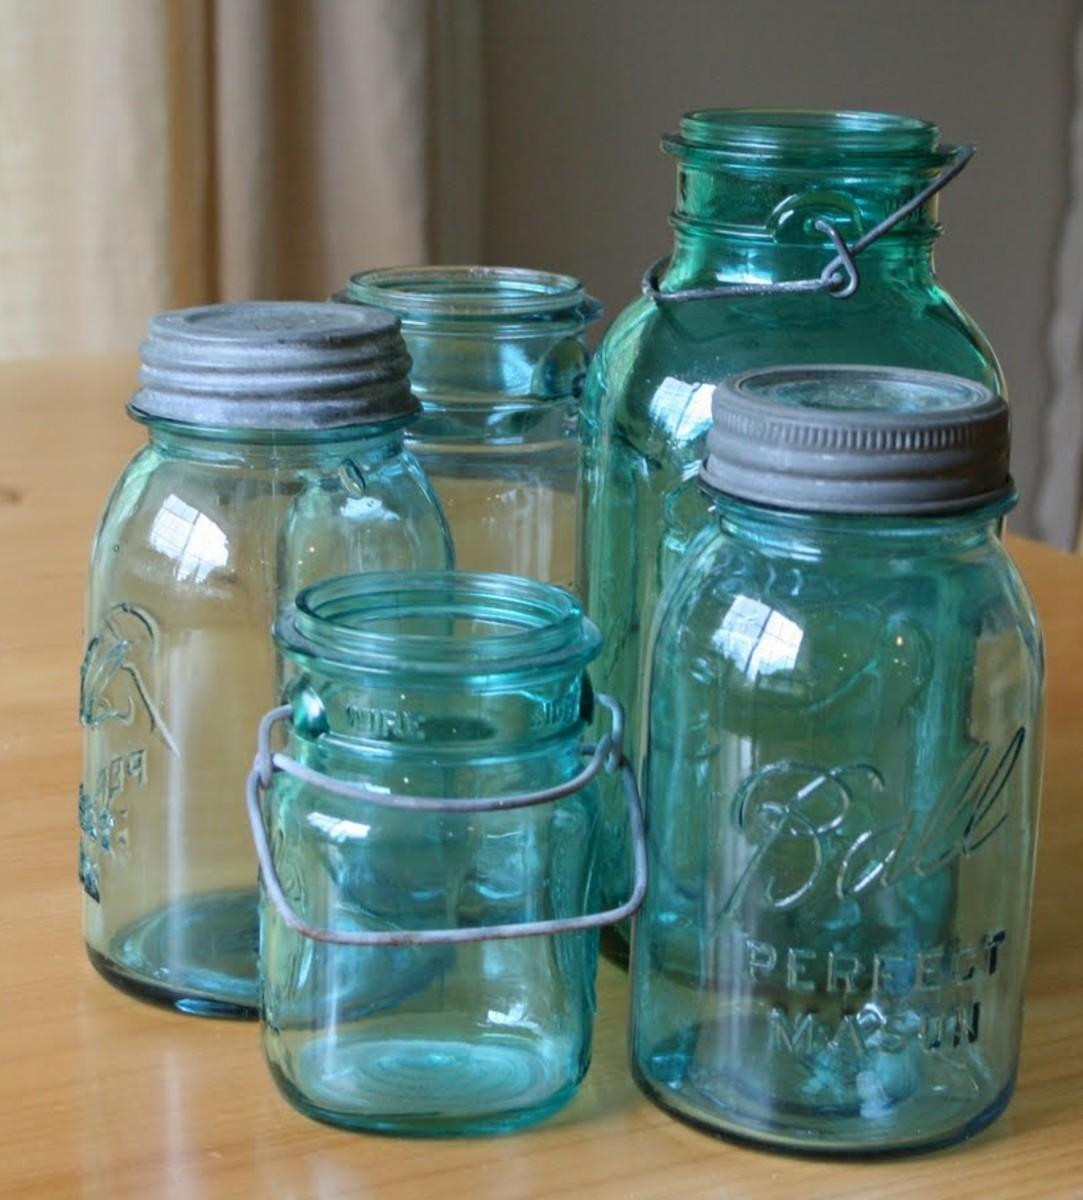 Easy Mason Jar Craft Project Ideas  FeltMagnet